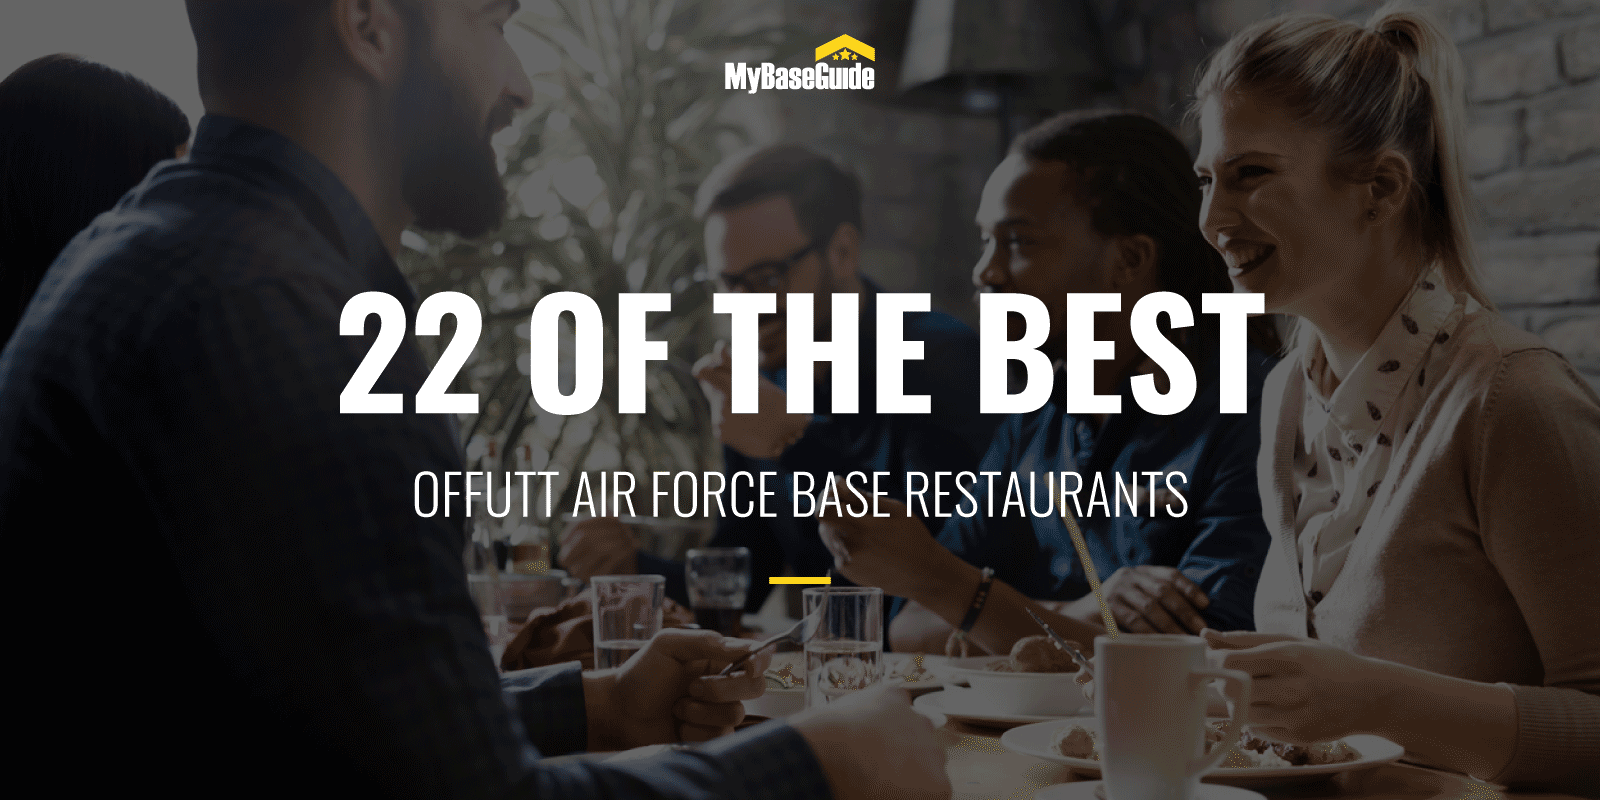 22 of the Best Offutt AFB Restaurants